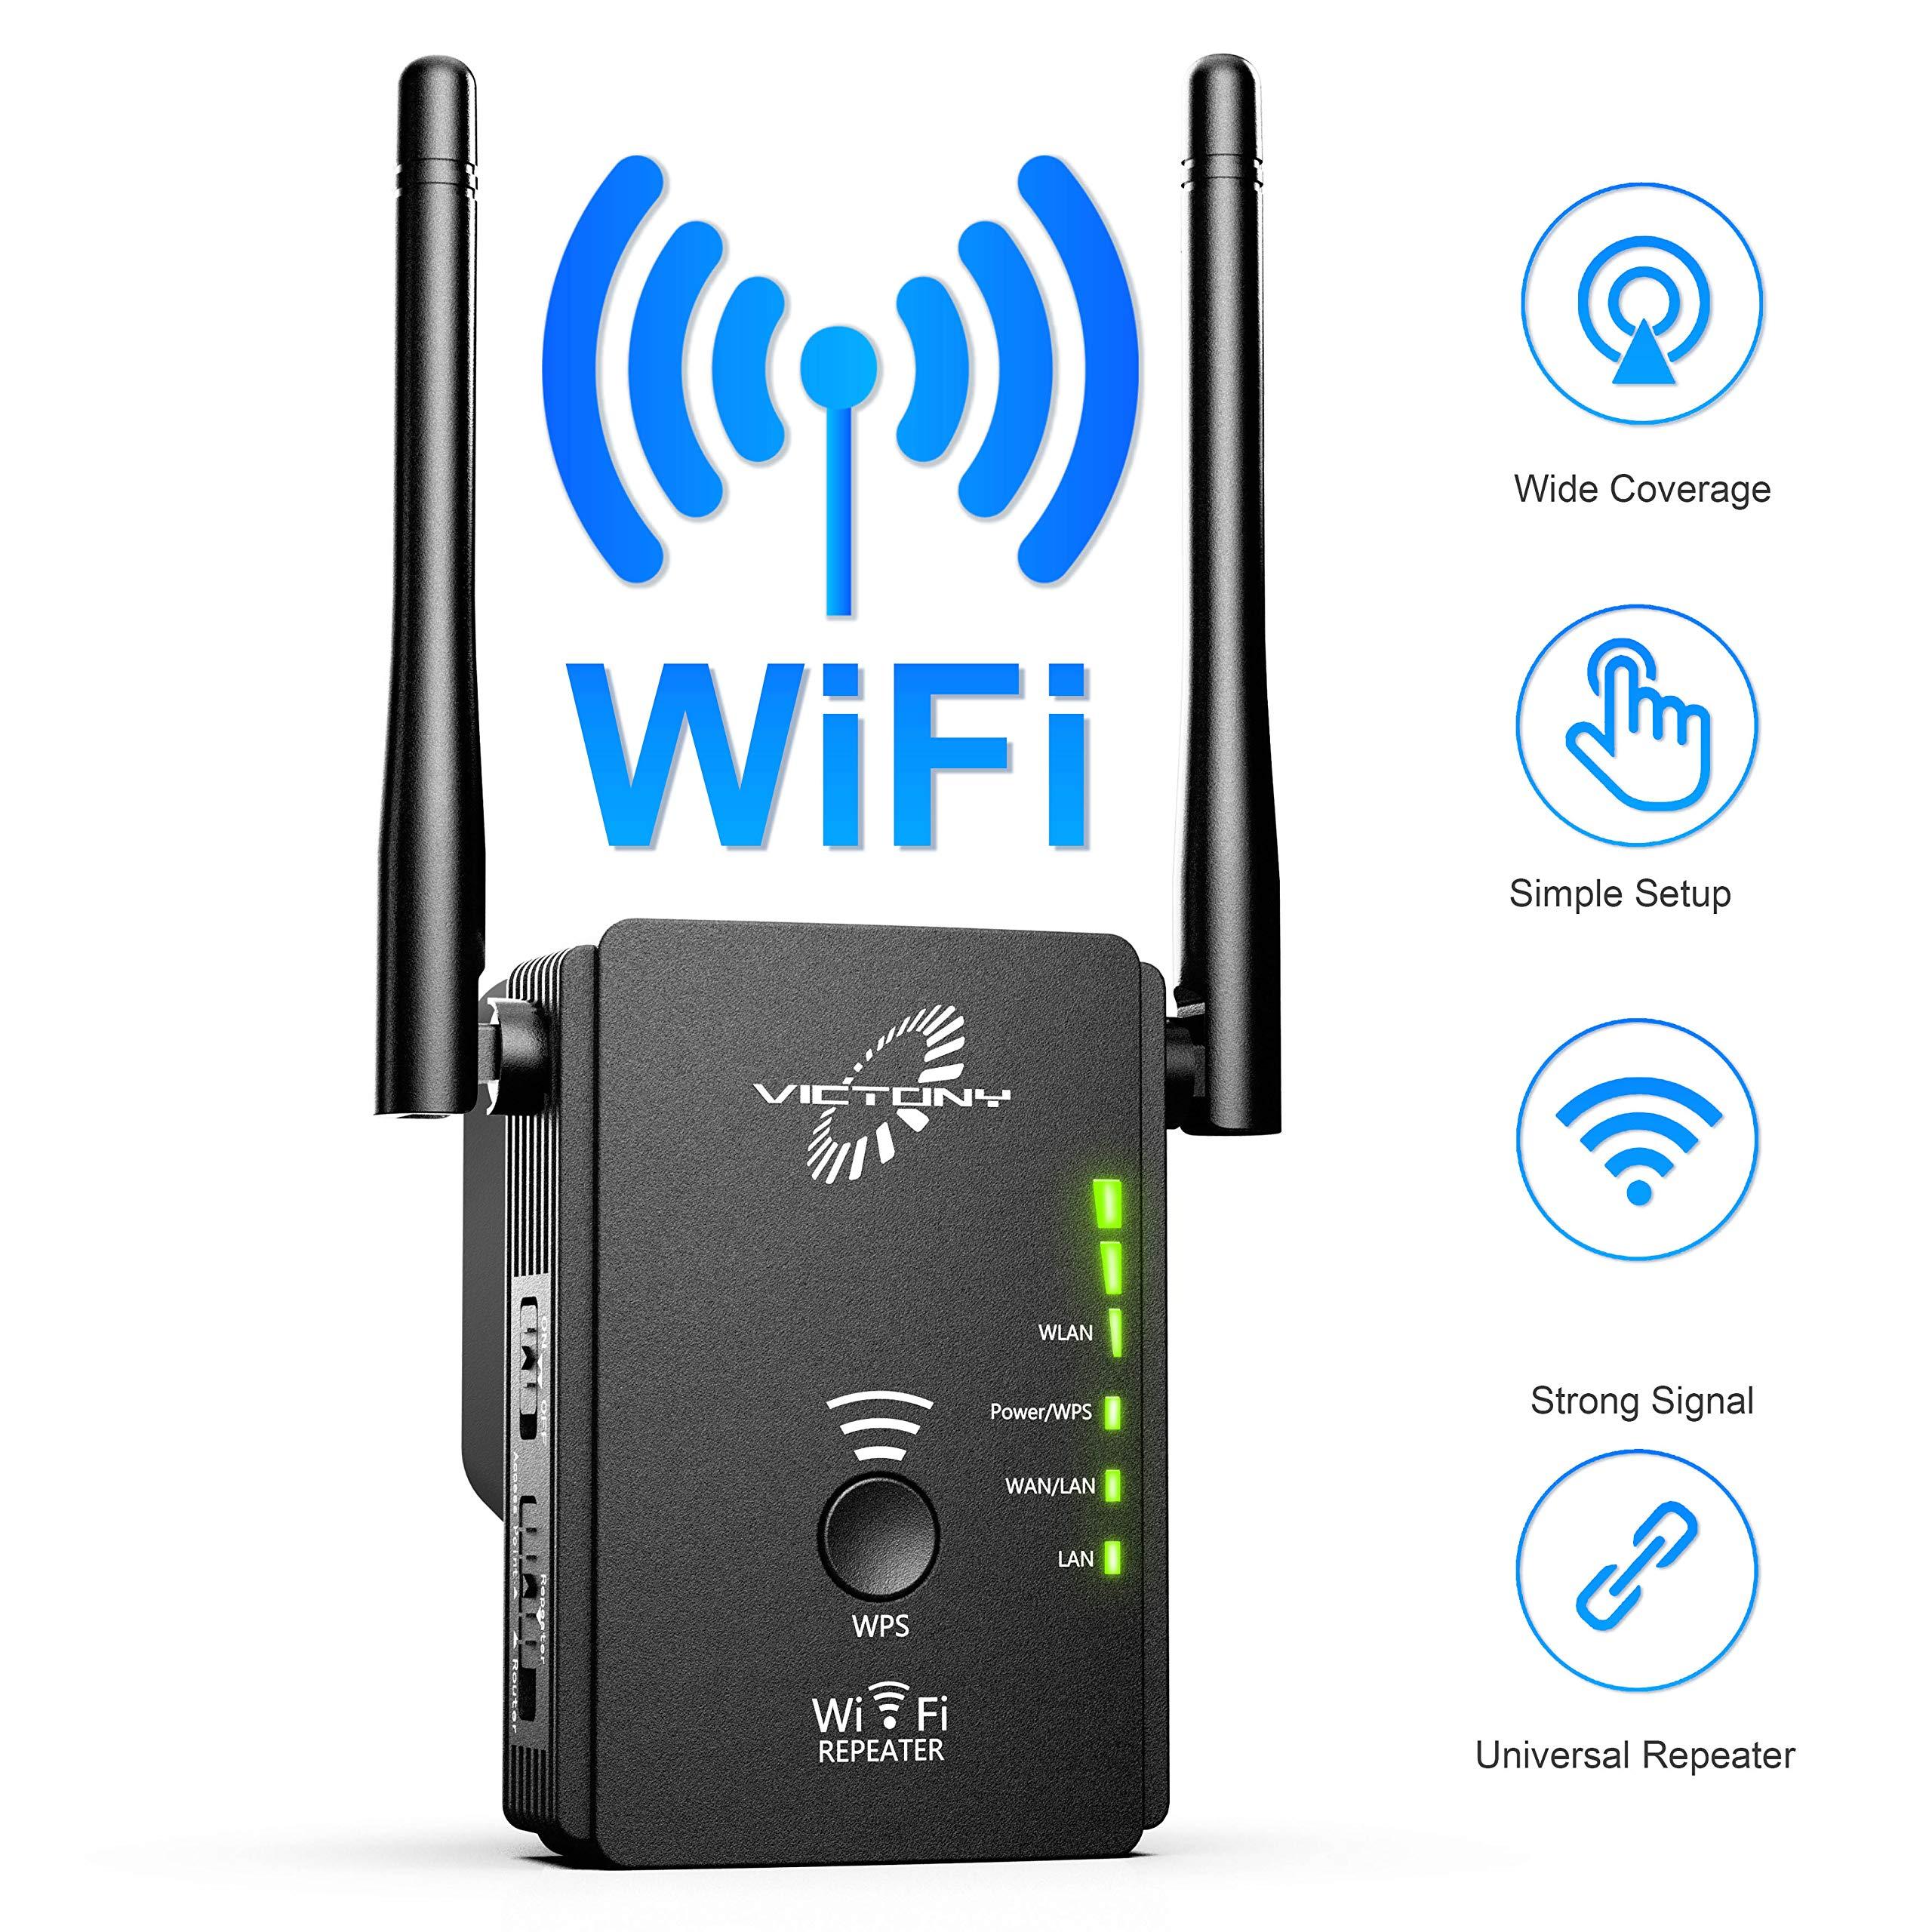 VICTONY 300Mbps Mini WiFi Range Extender 360 Degree Full Coverage External Antenna High Gain Dual Band Range Extender by VICTONYUS